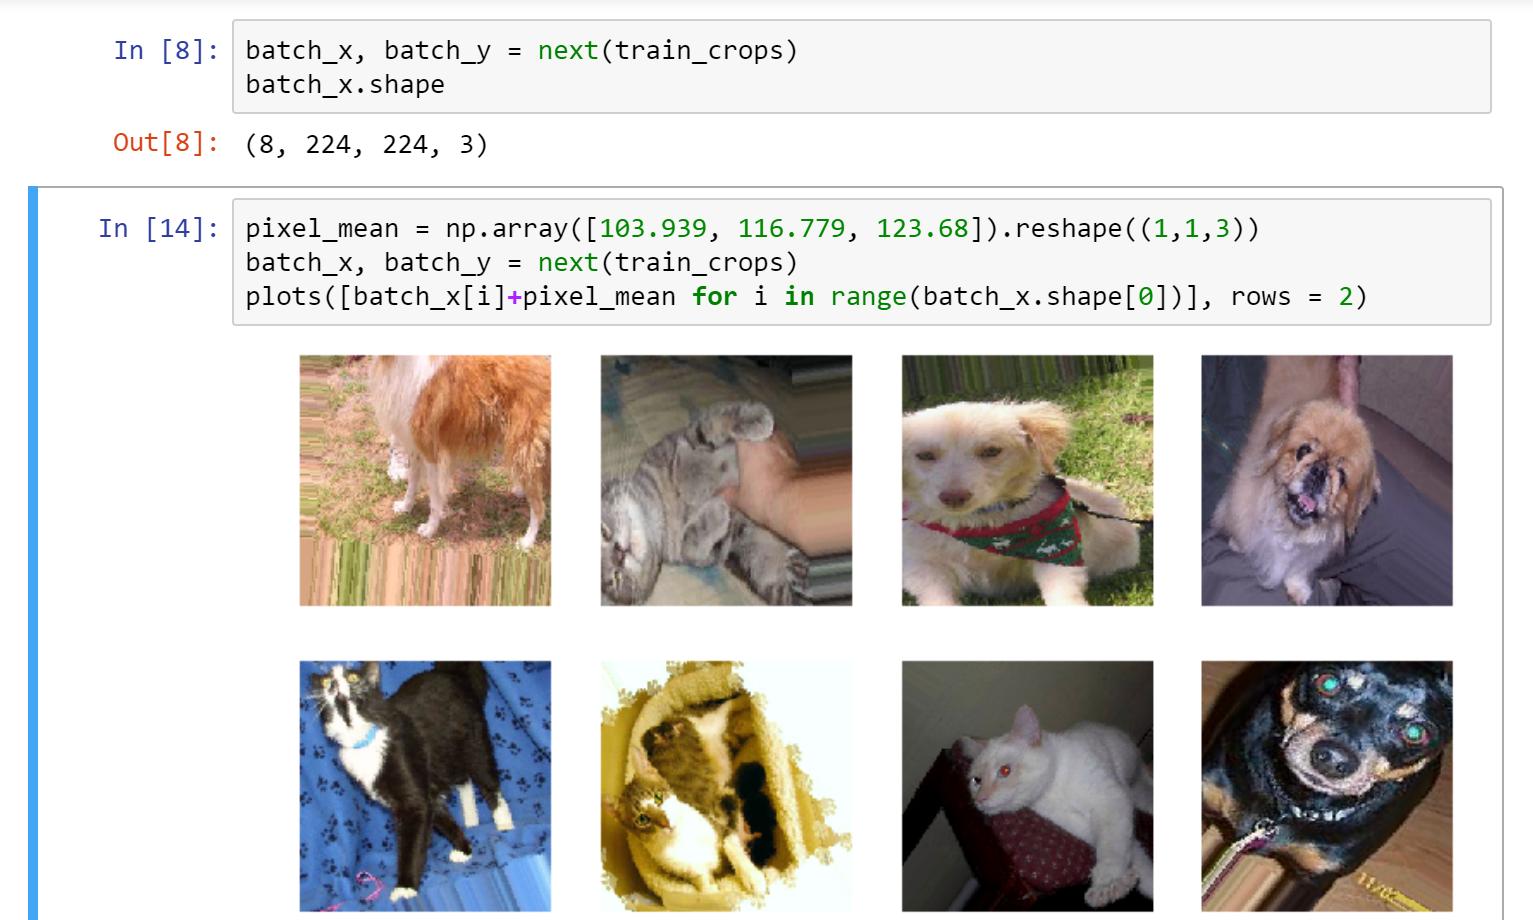 Extending Keras' ImageDataGenerator to Support Random Cropping